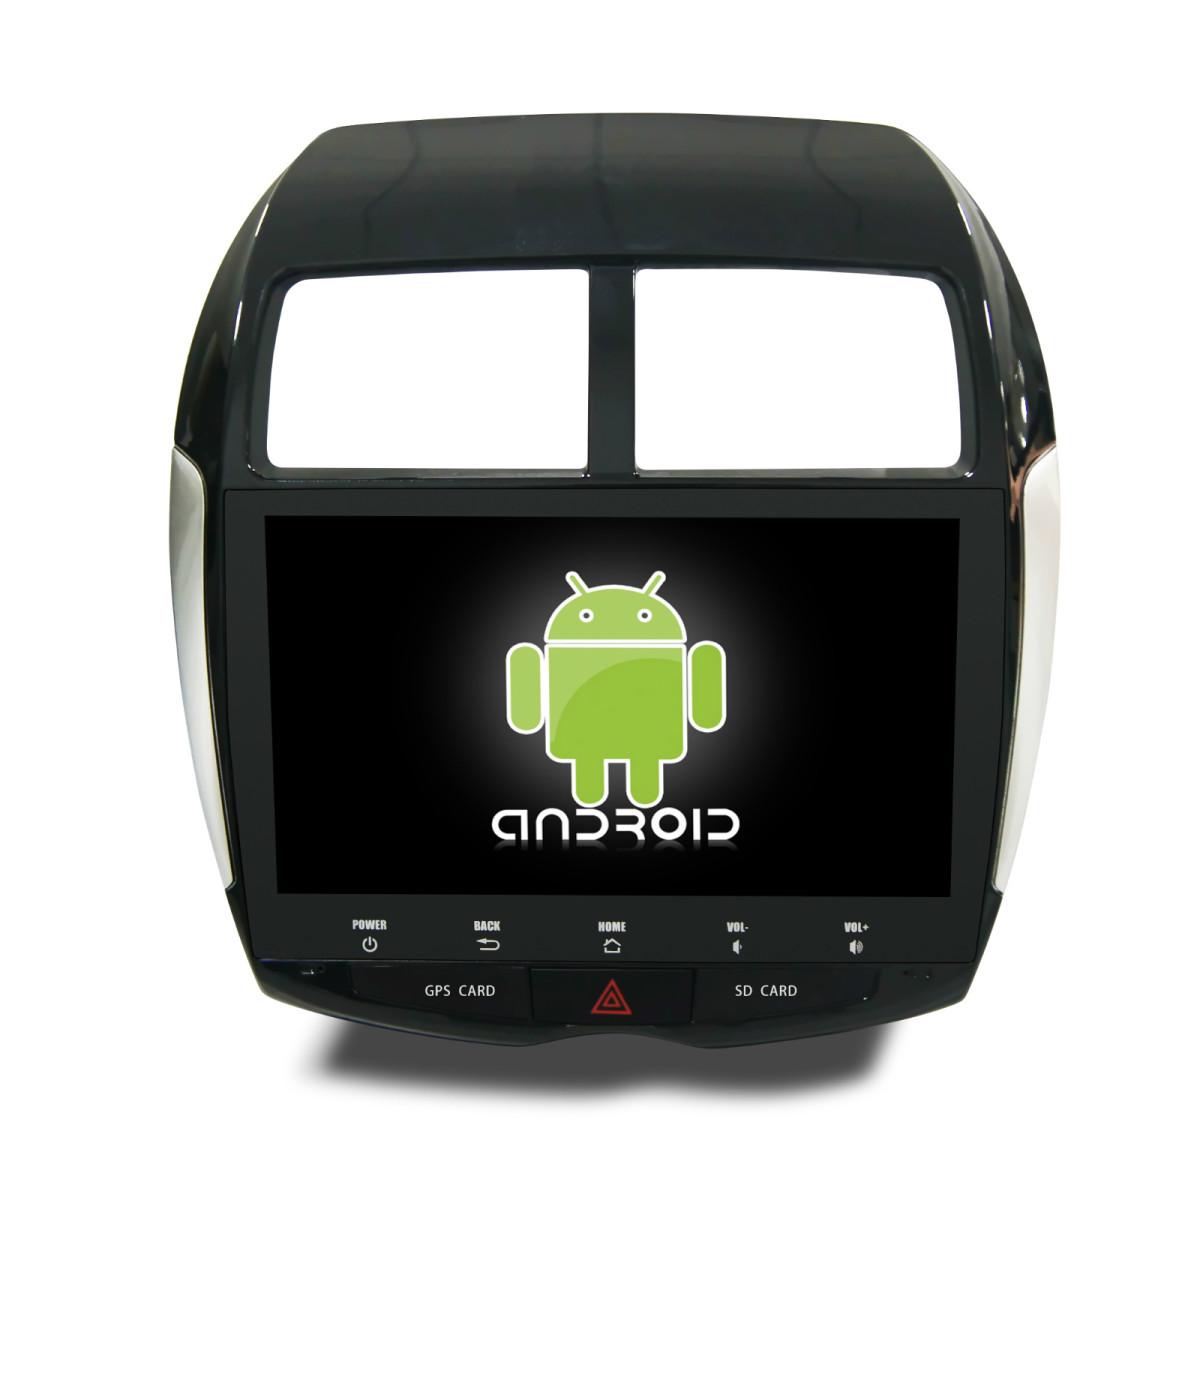 Штатная магнитола CARMEDIA QR-1046-T8 Mitsubishi ASX/RVR, Citroën C4 AirCross, Peugeot 4008 на OC Android 7.1.2 / 8.1 автомобильный dvd плеер lg android 4 4 8 dvd citroen c4 aircross peugeot 4008 mitsubishi asx 2010 2011 gps